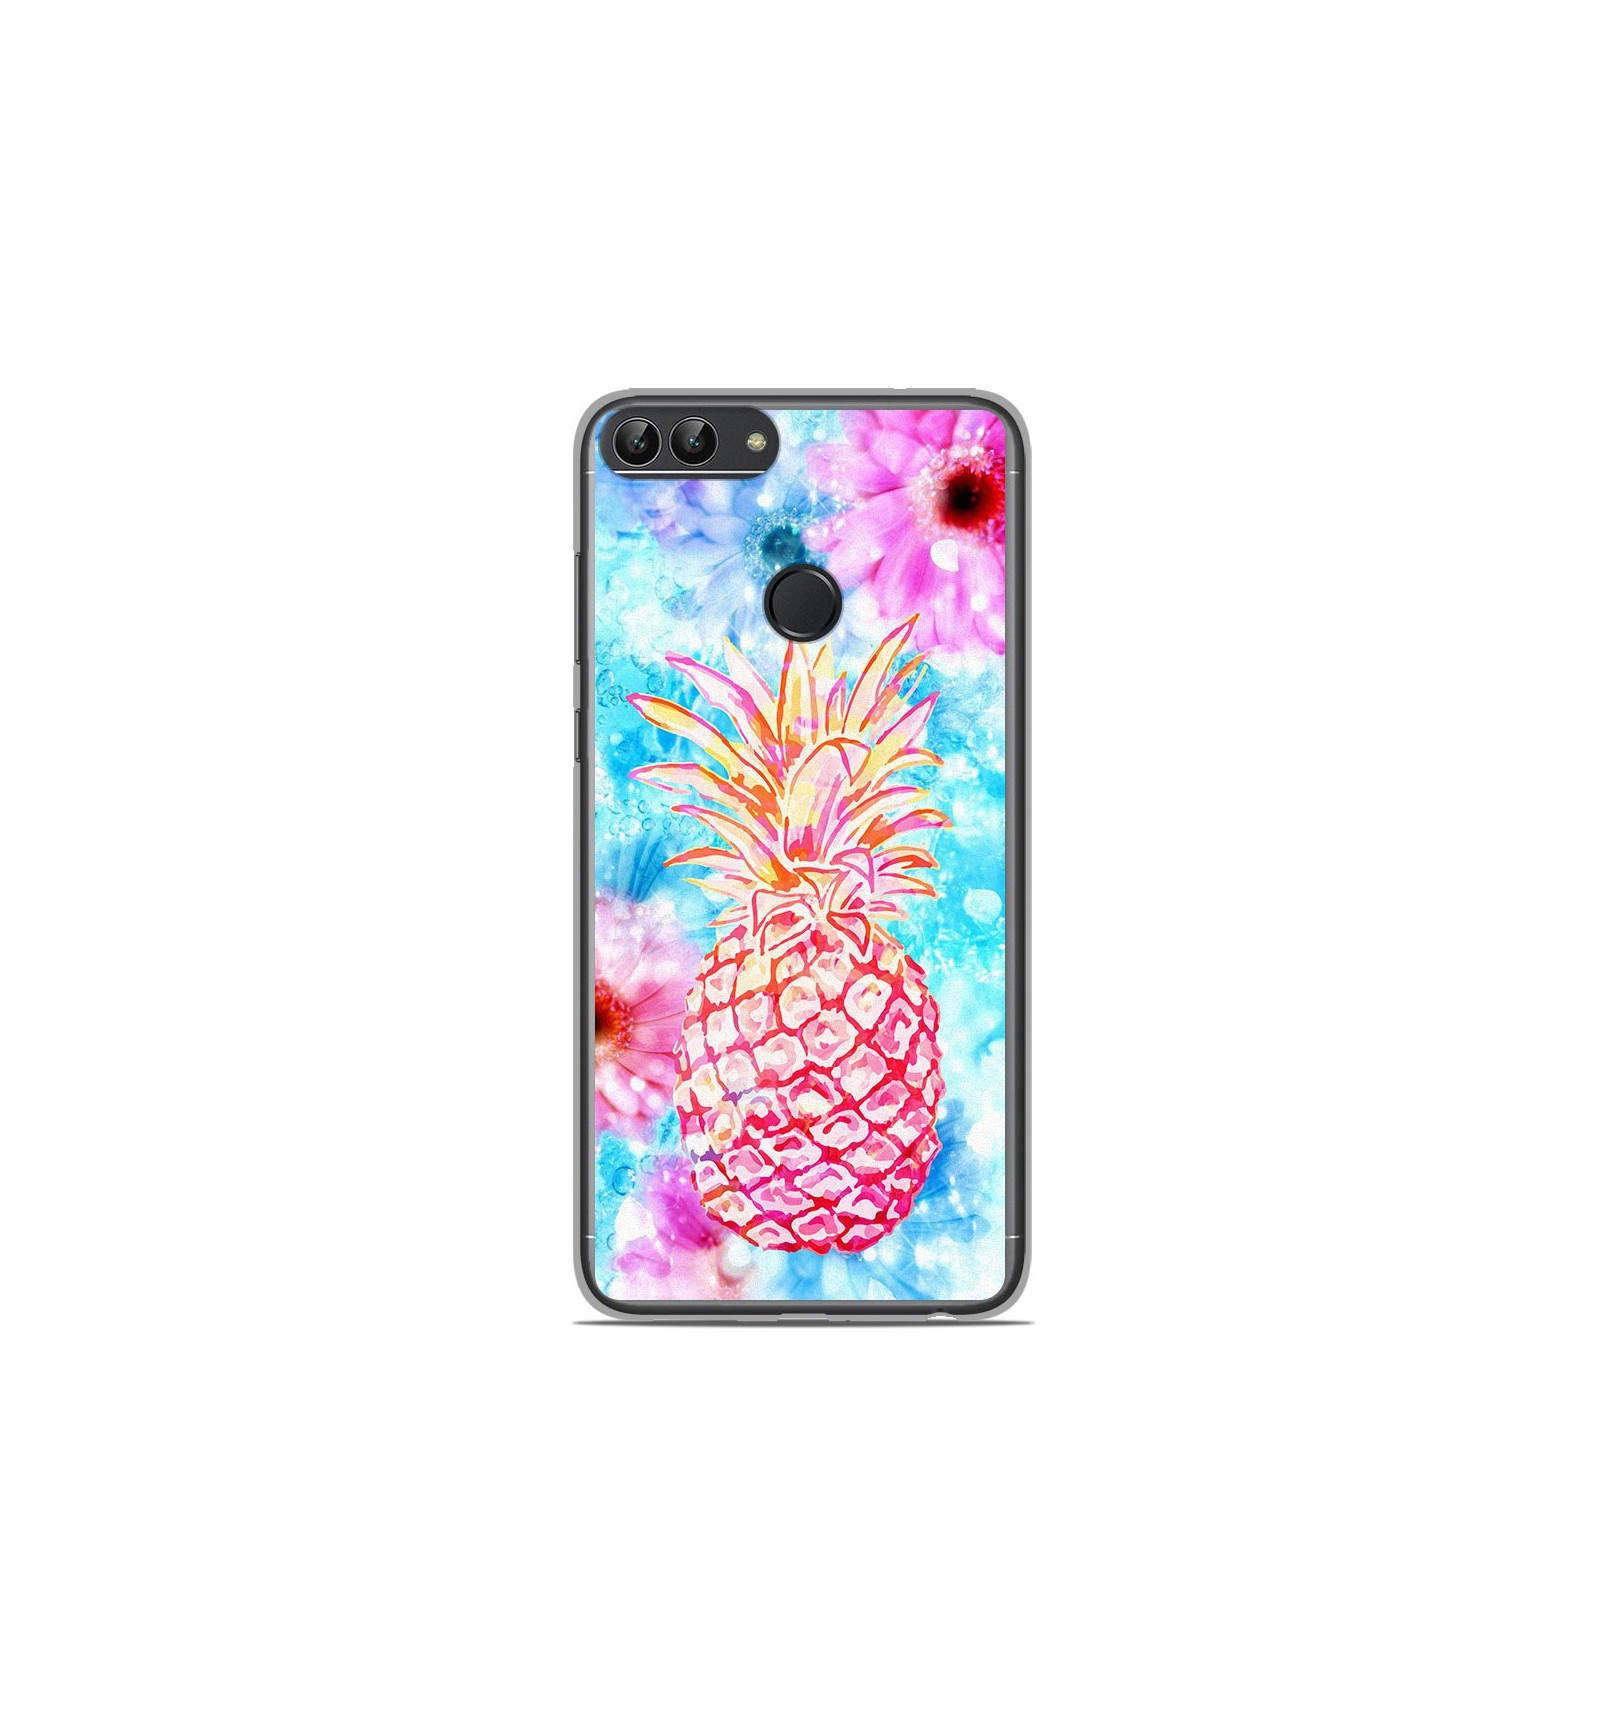 Coque en silicone Huawei P Smart - Ananas